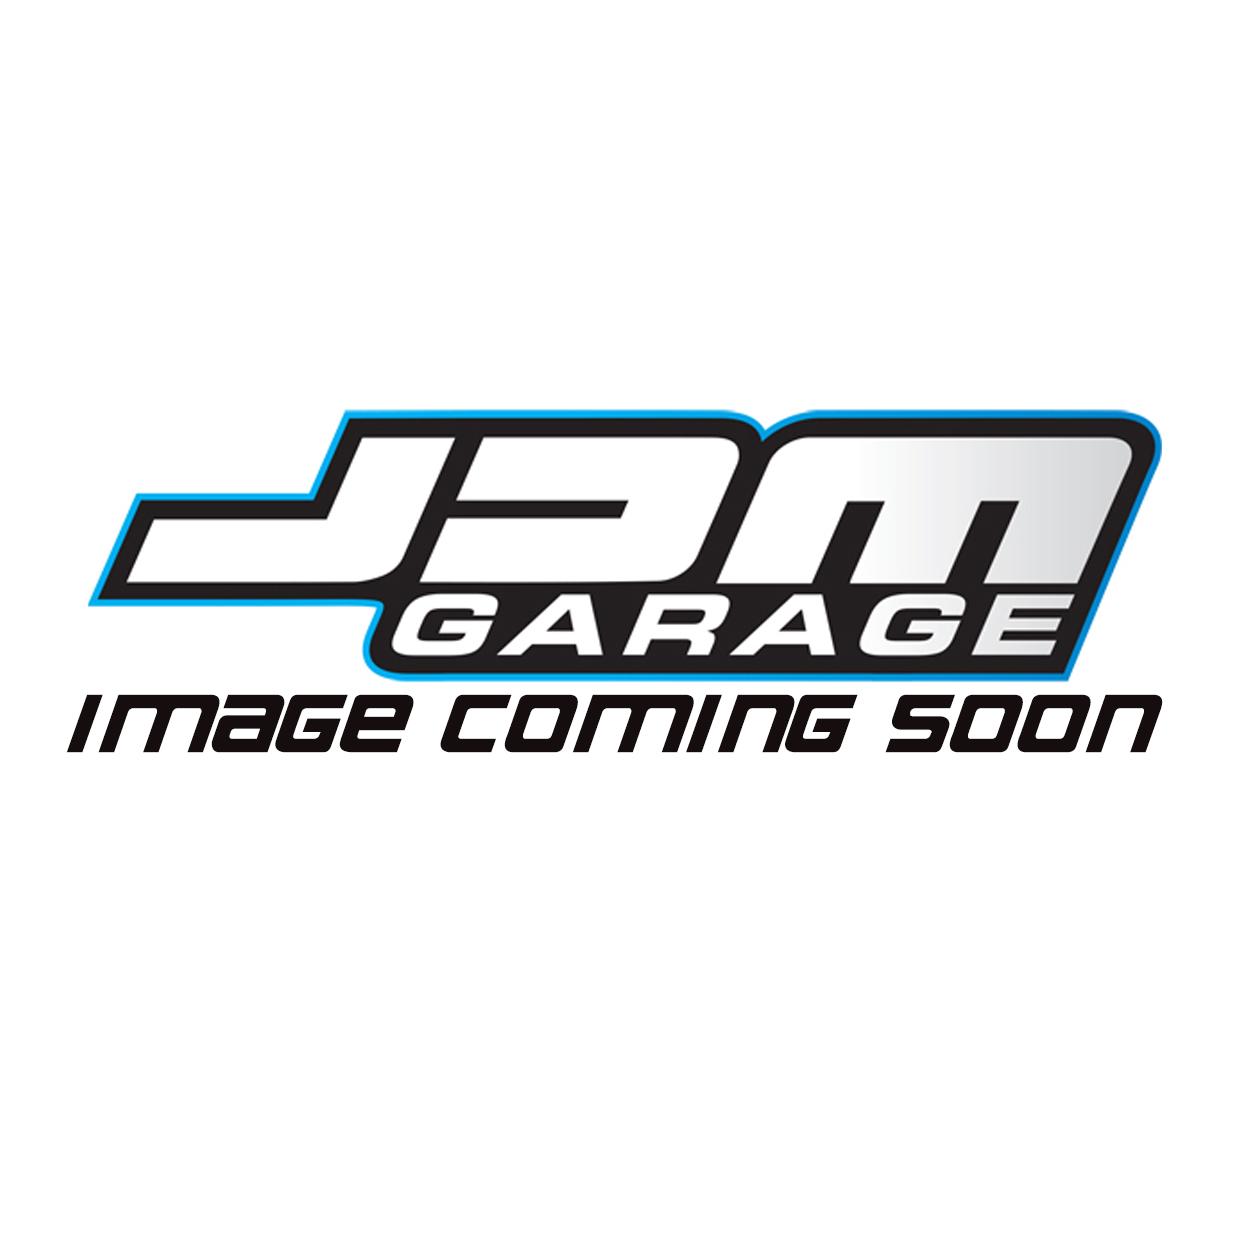 Nissan Navara D22 Stainless Steel Exhaust System